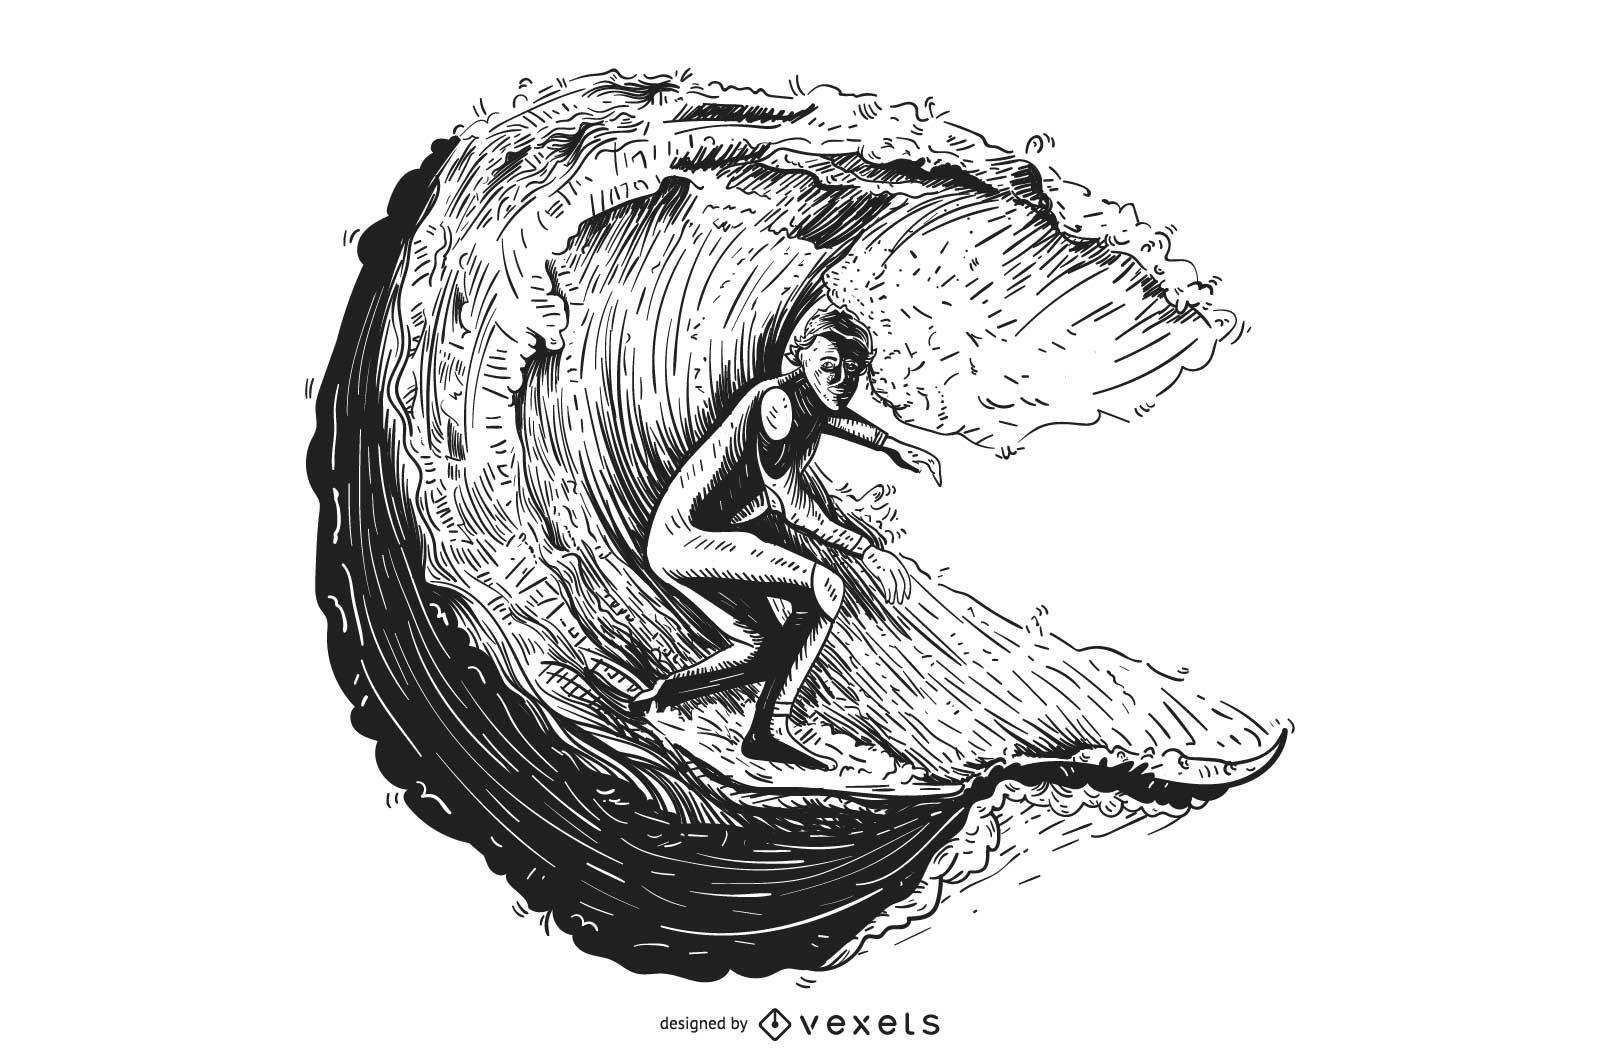 Surfing Illustration Sketch Style